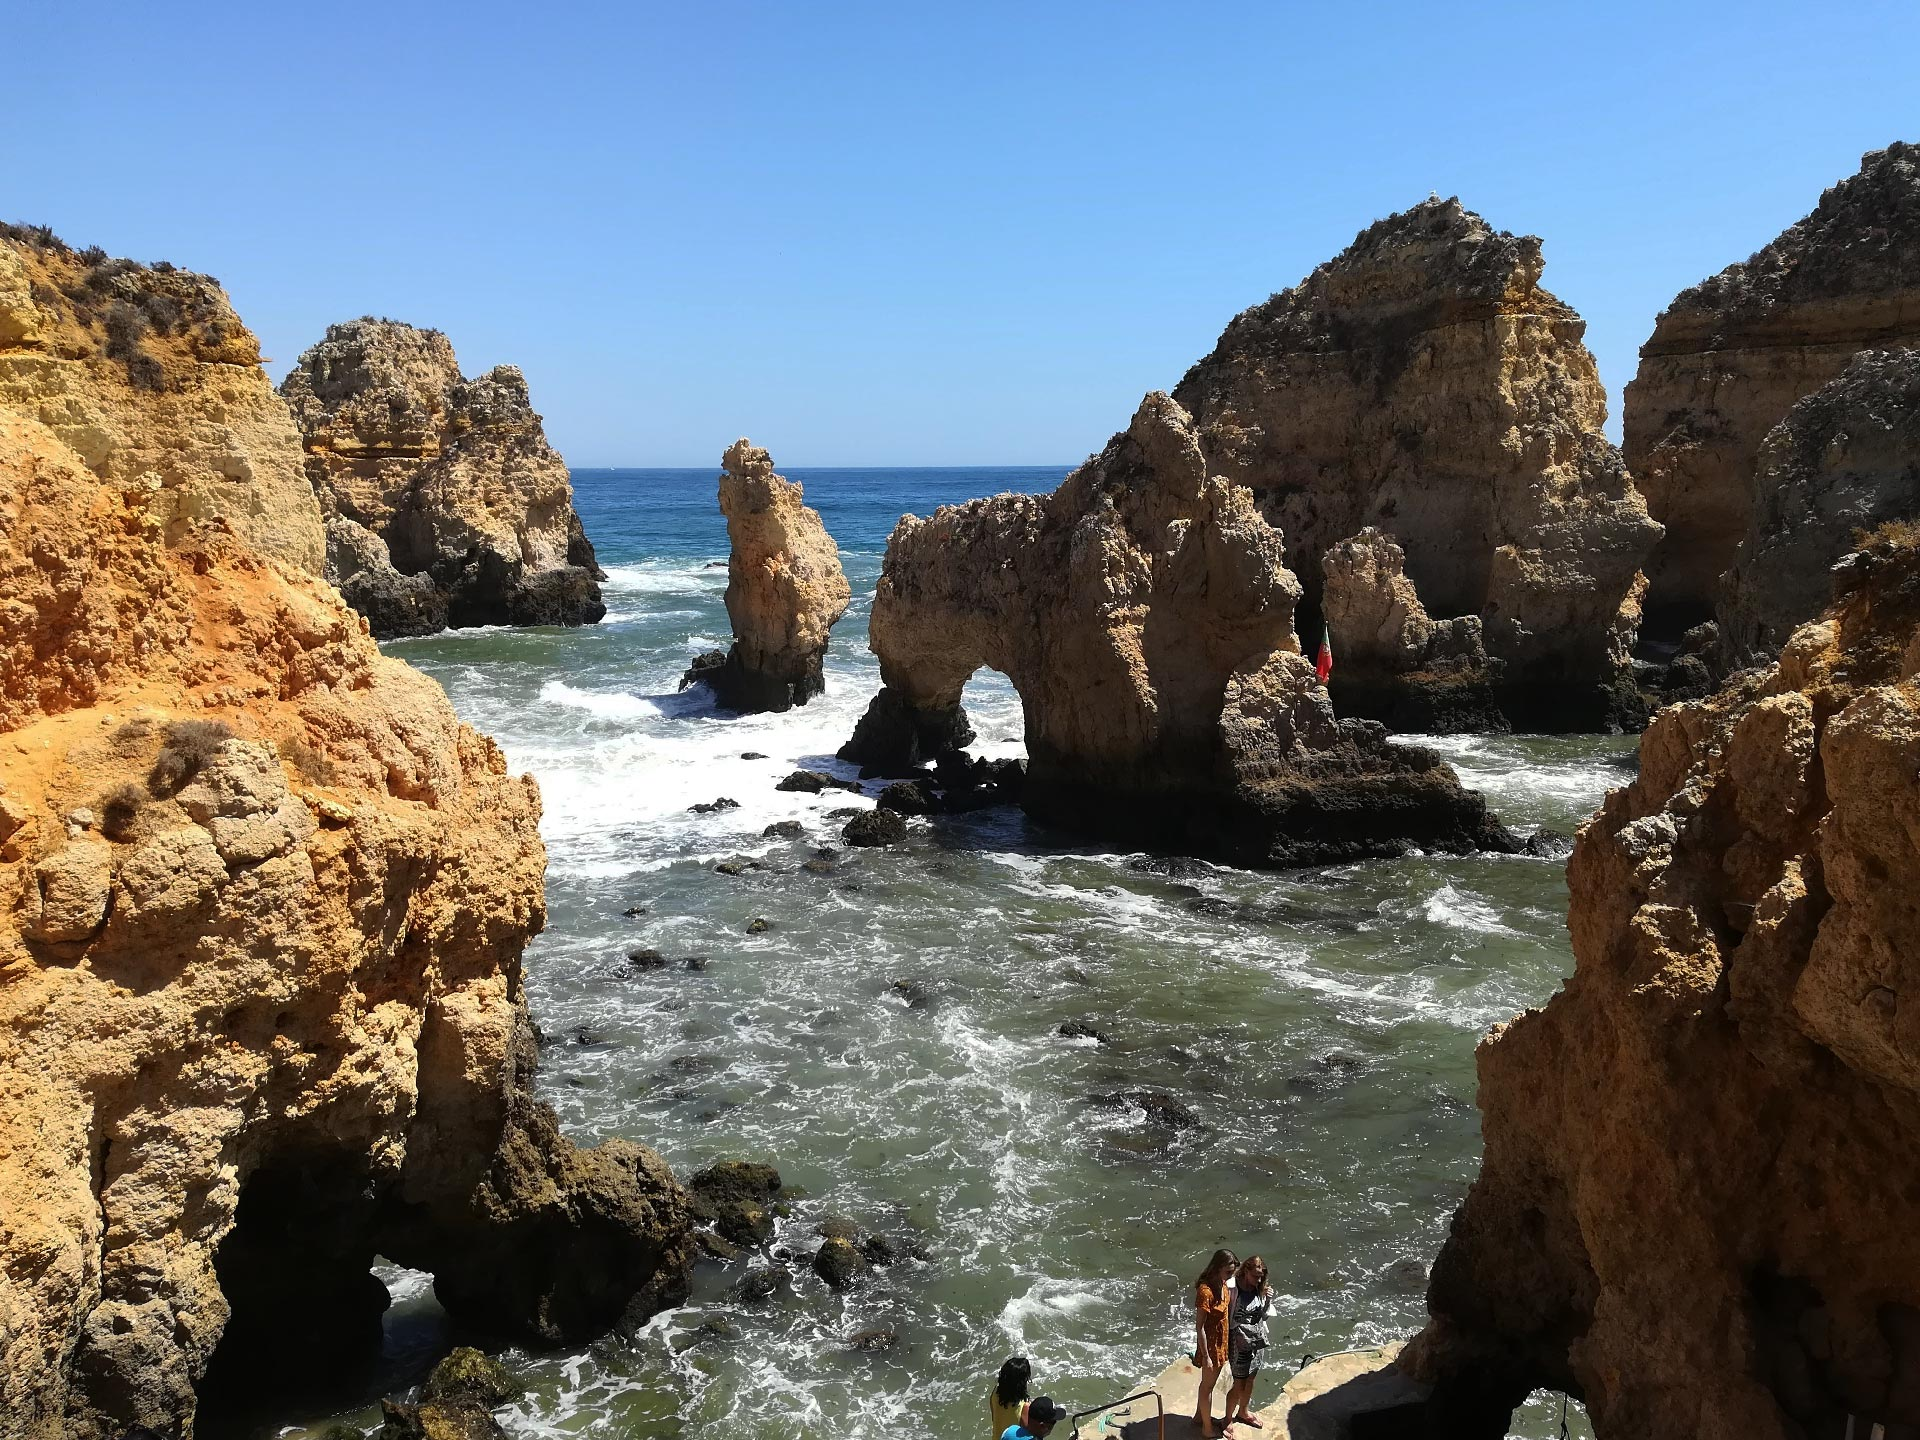 Scorcio su Ponta de Piedade, (spiaggia), ben visibili le falesie, Portimao, Portogallo